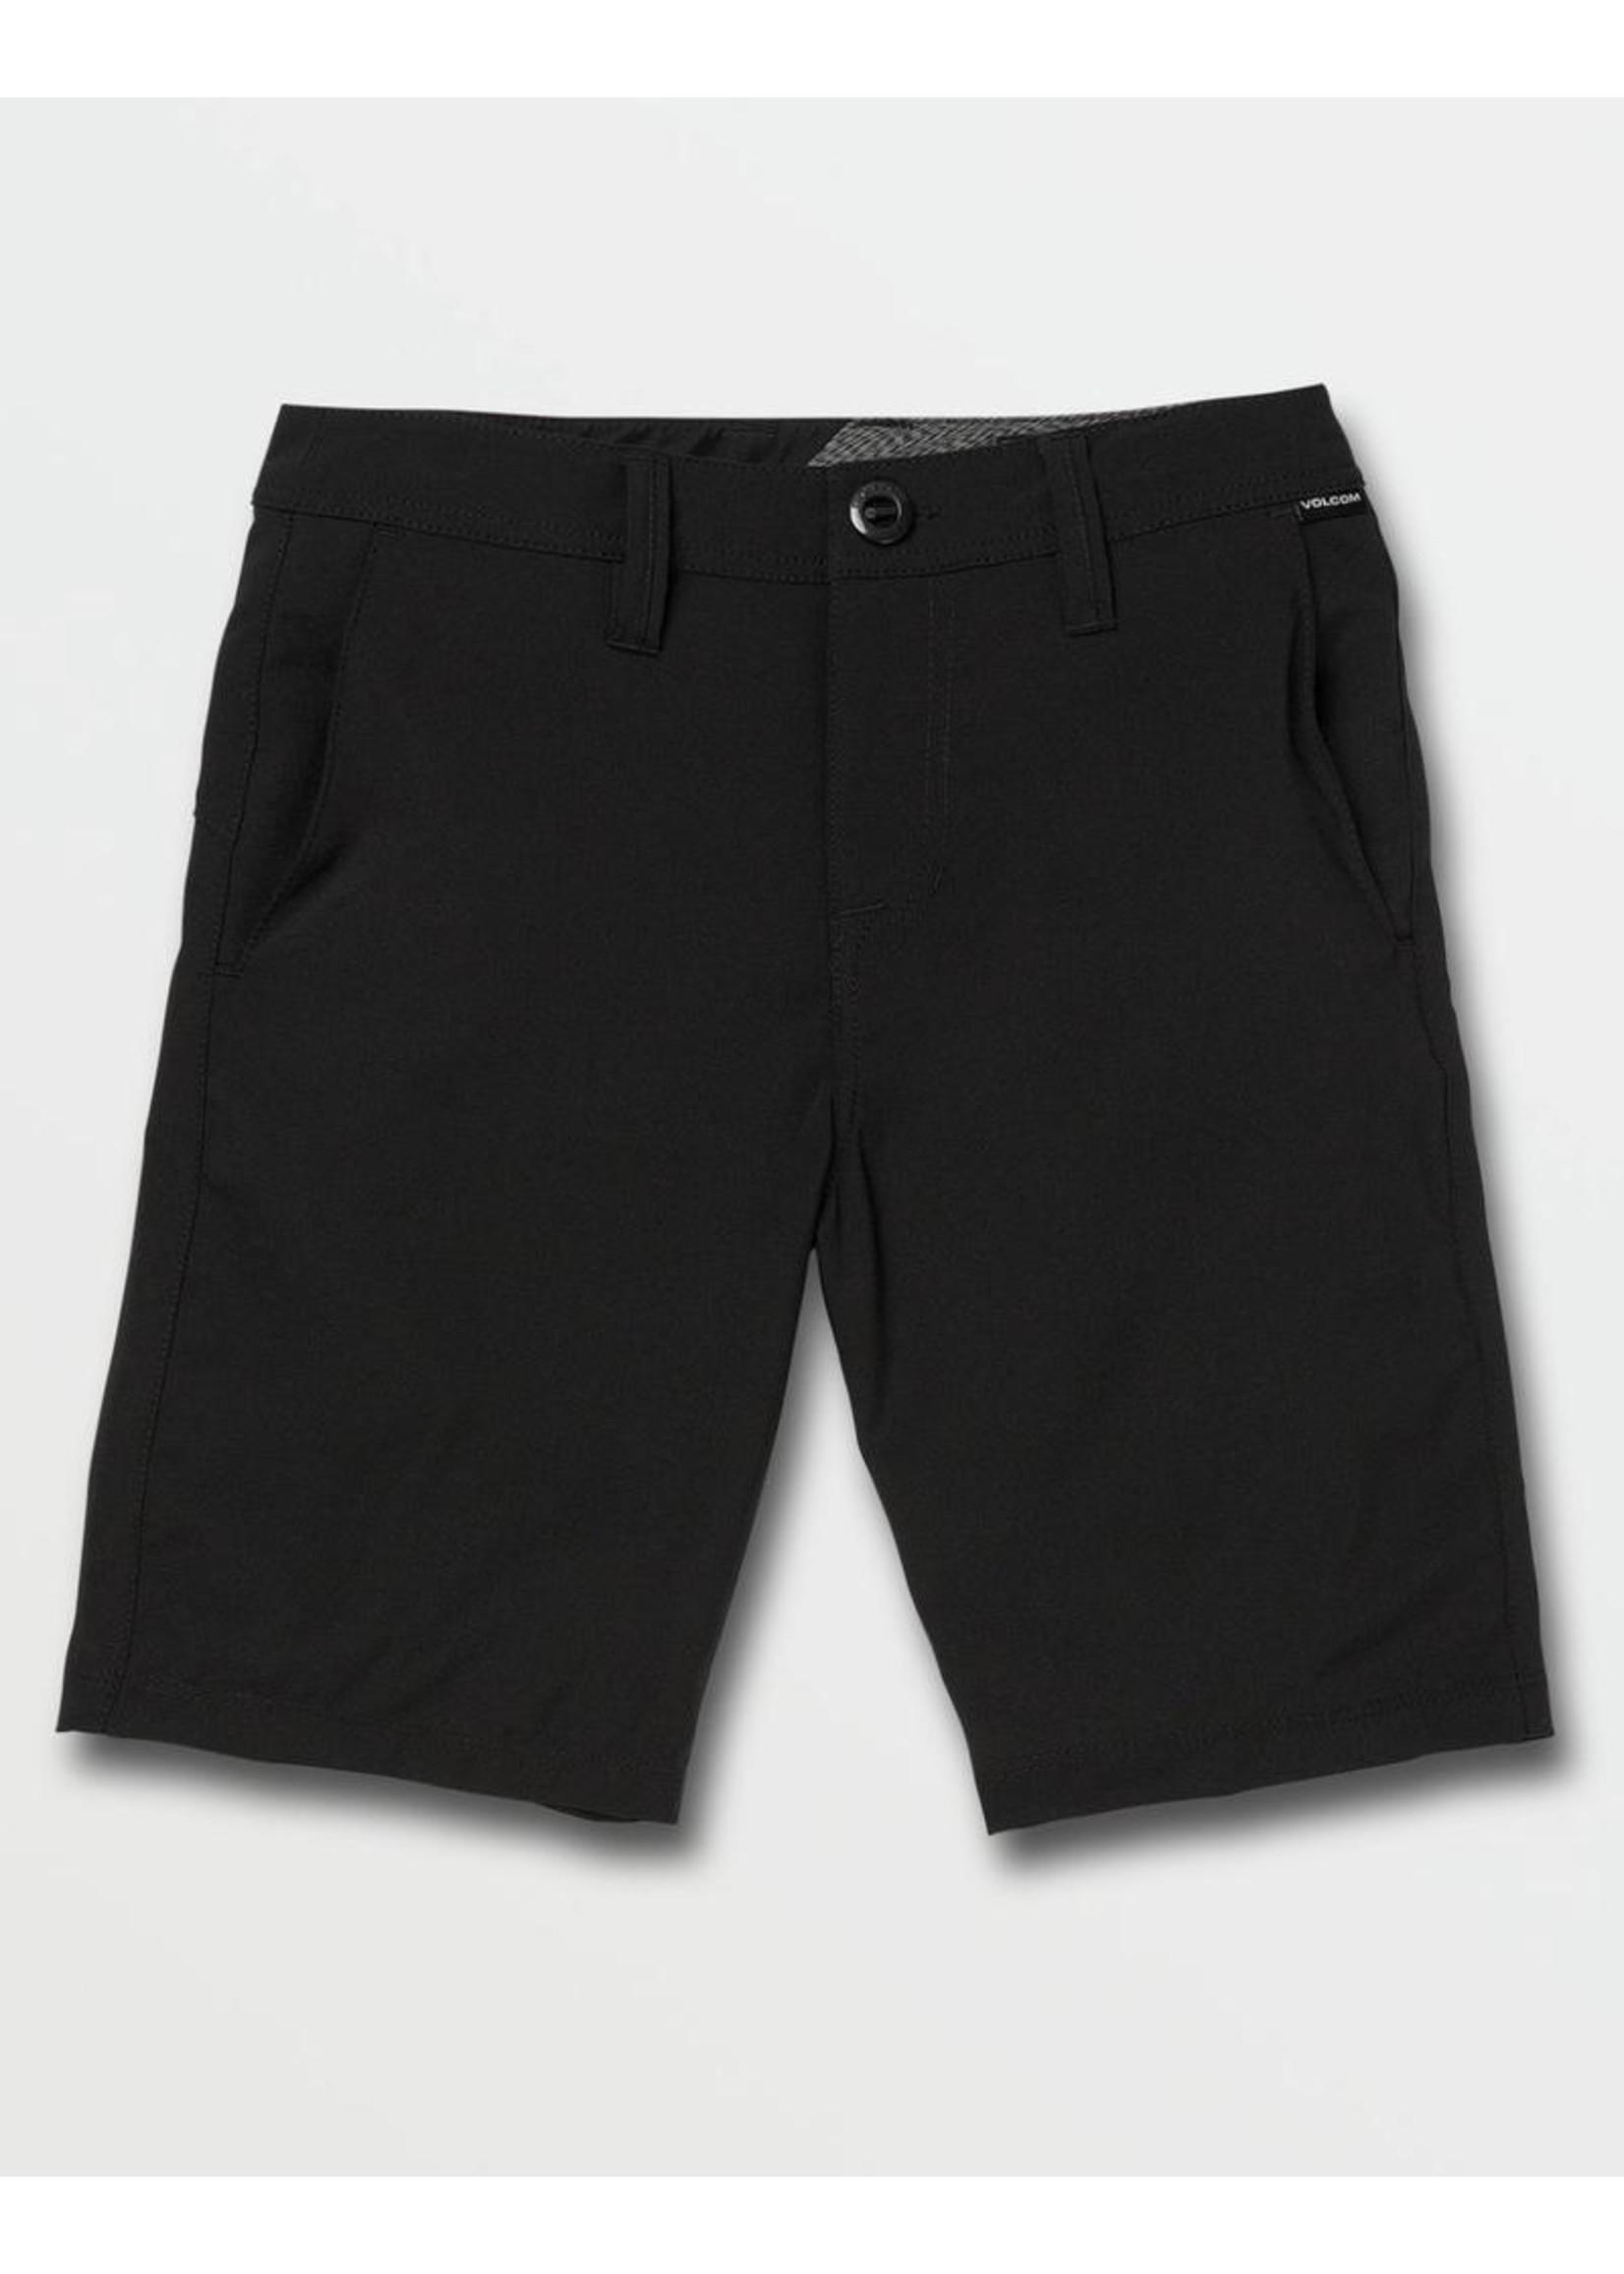 Volcom Volcom Kids, Little Boys Blackout Fricken Surf N' Turf Static Shorts